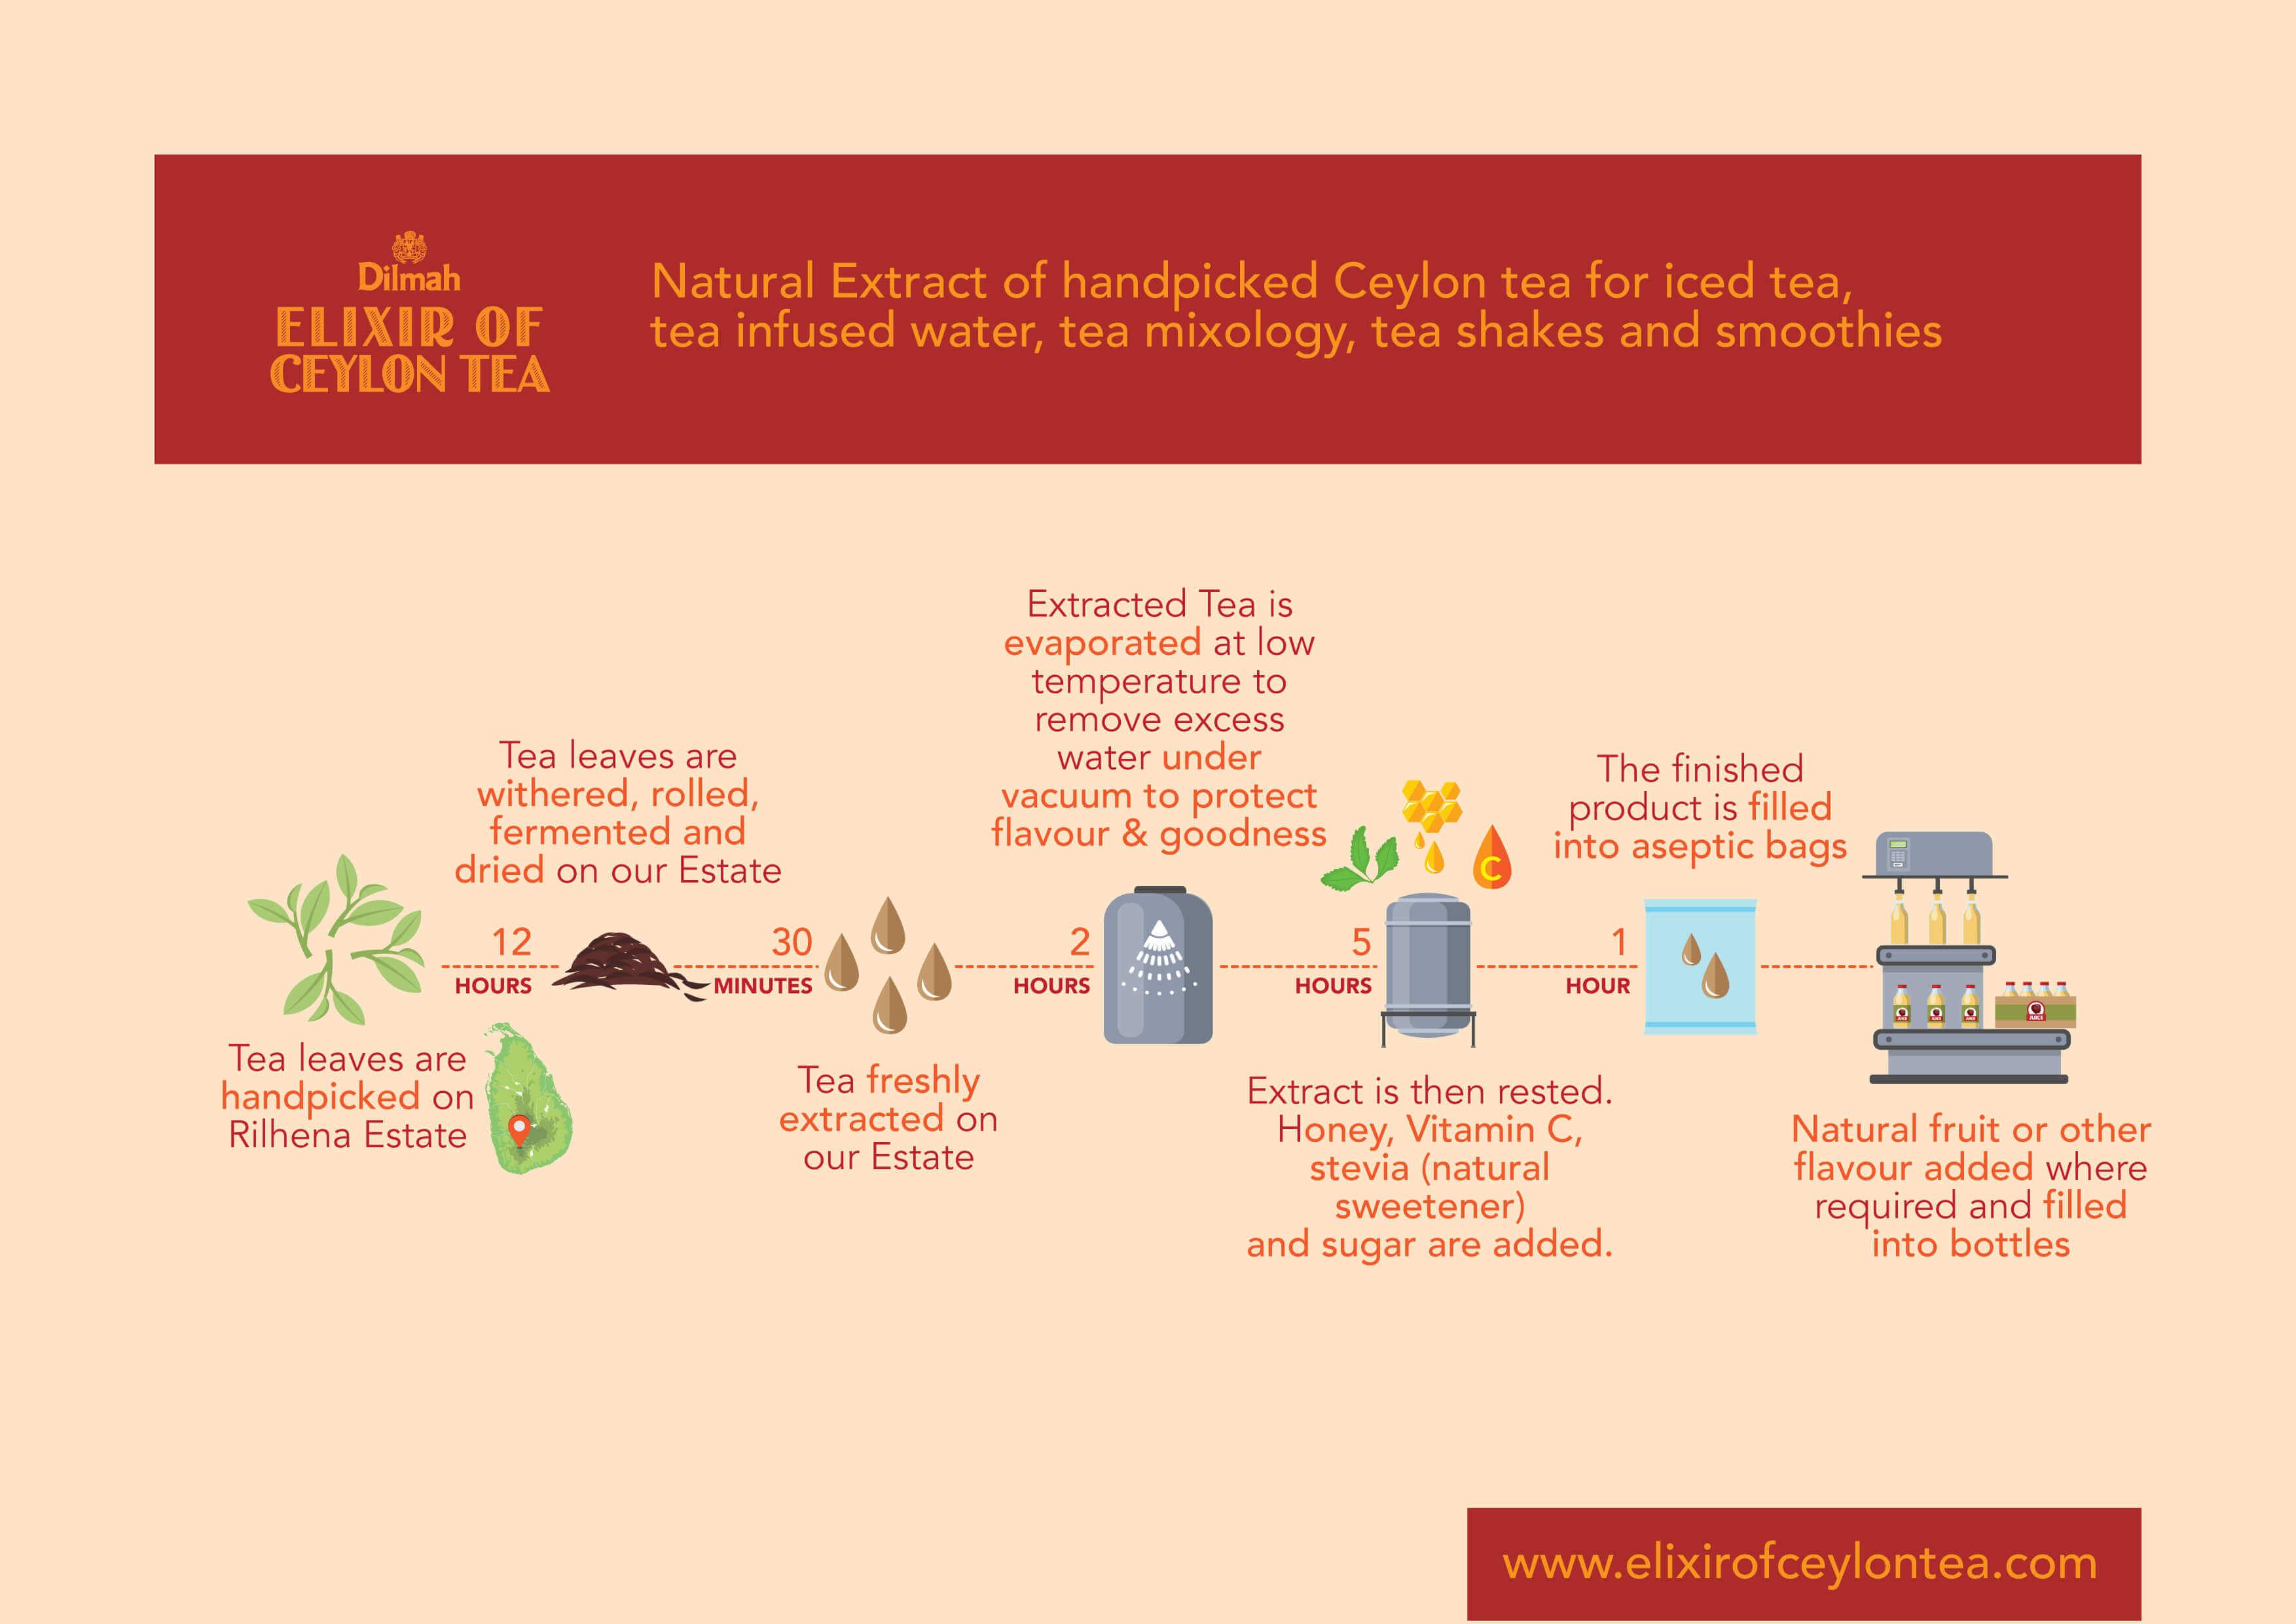 Manufacturing Chart of Elixir of Ceylon Tea